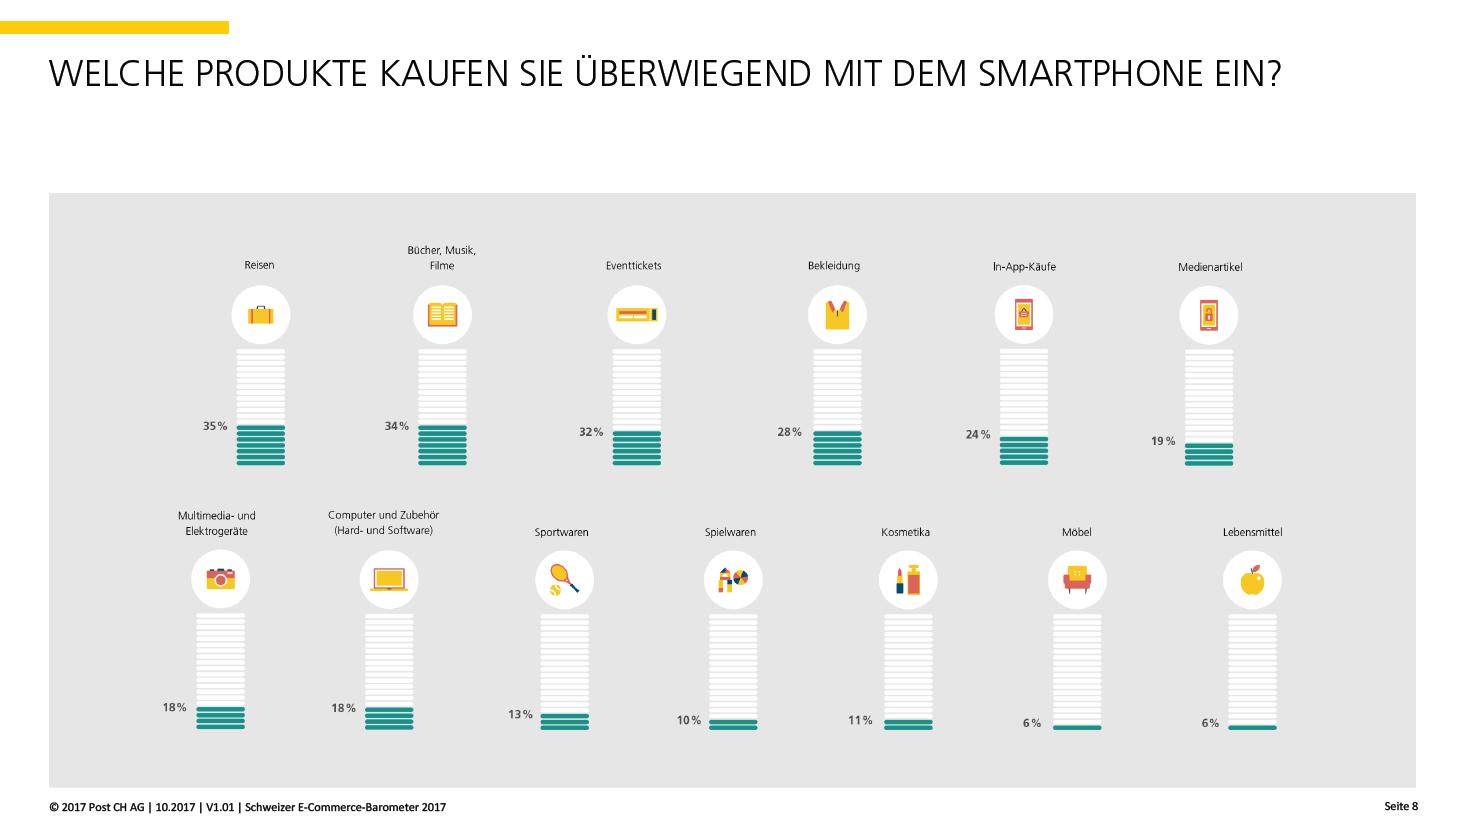 Quelle: 2017 Post CH AG   10.2017   V1.01   Schweizer E-Commerce Stimmungsbarometer 2017, S.8